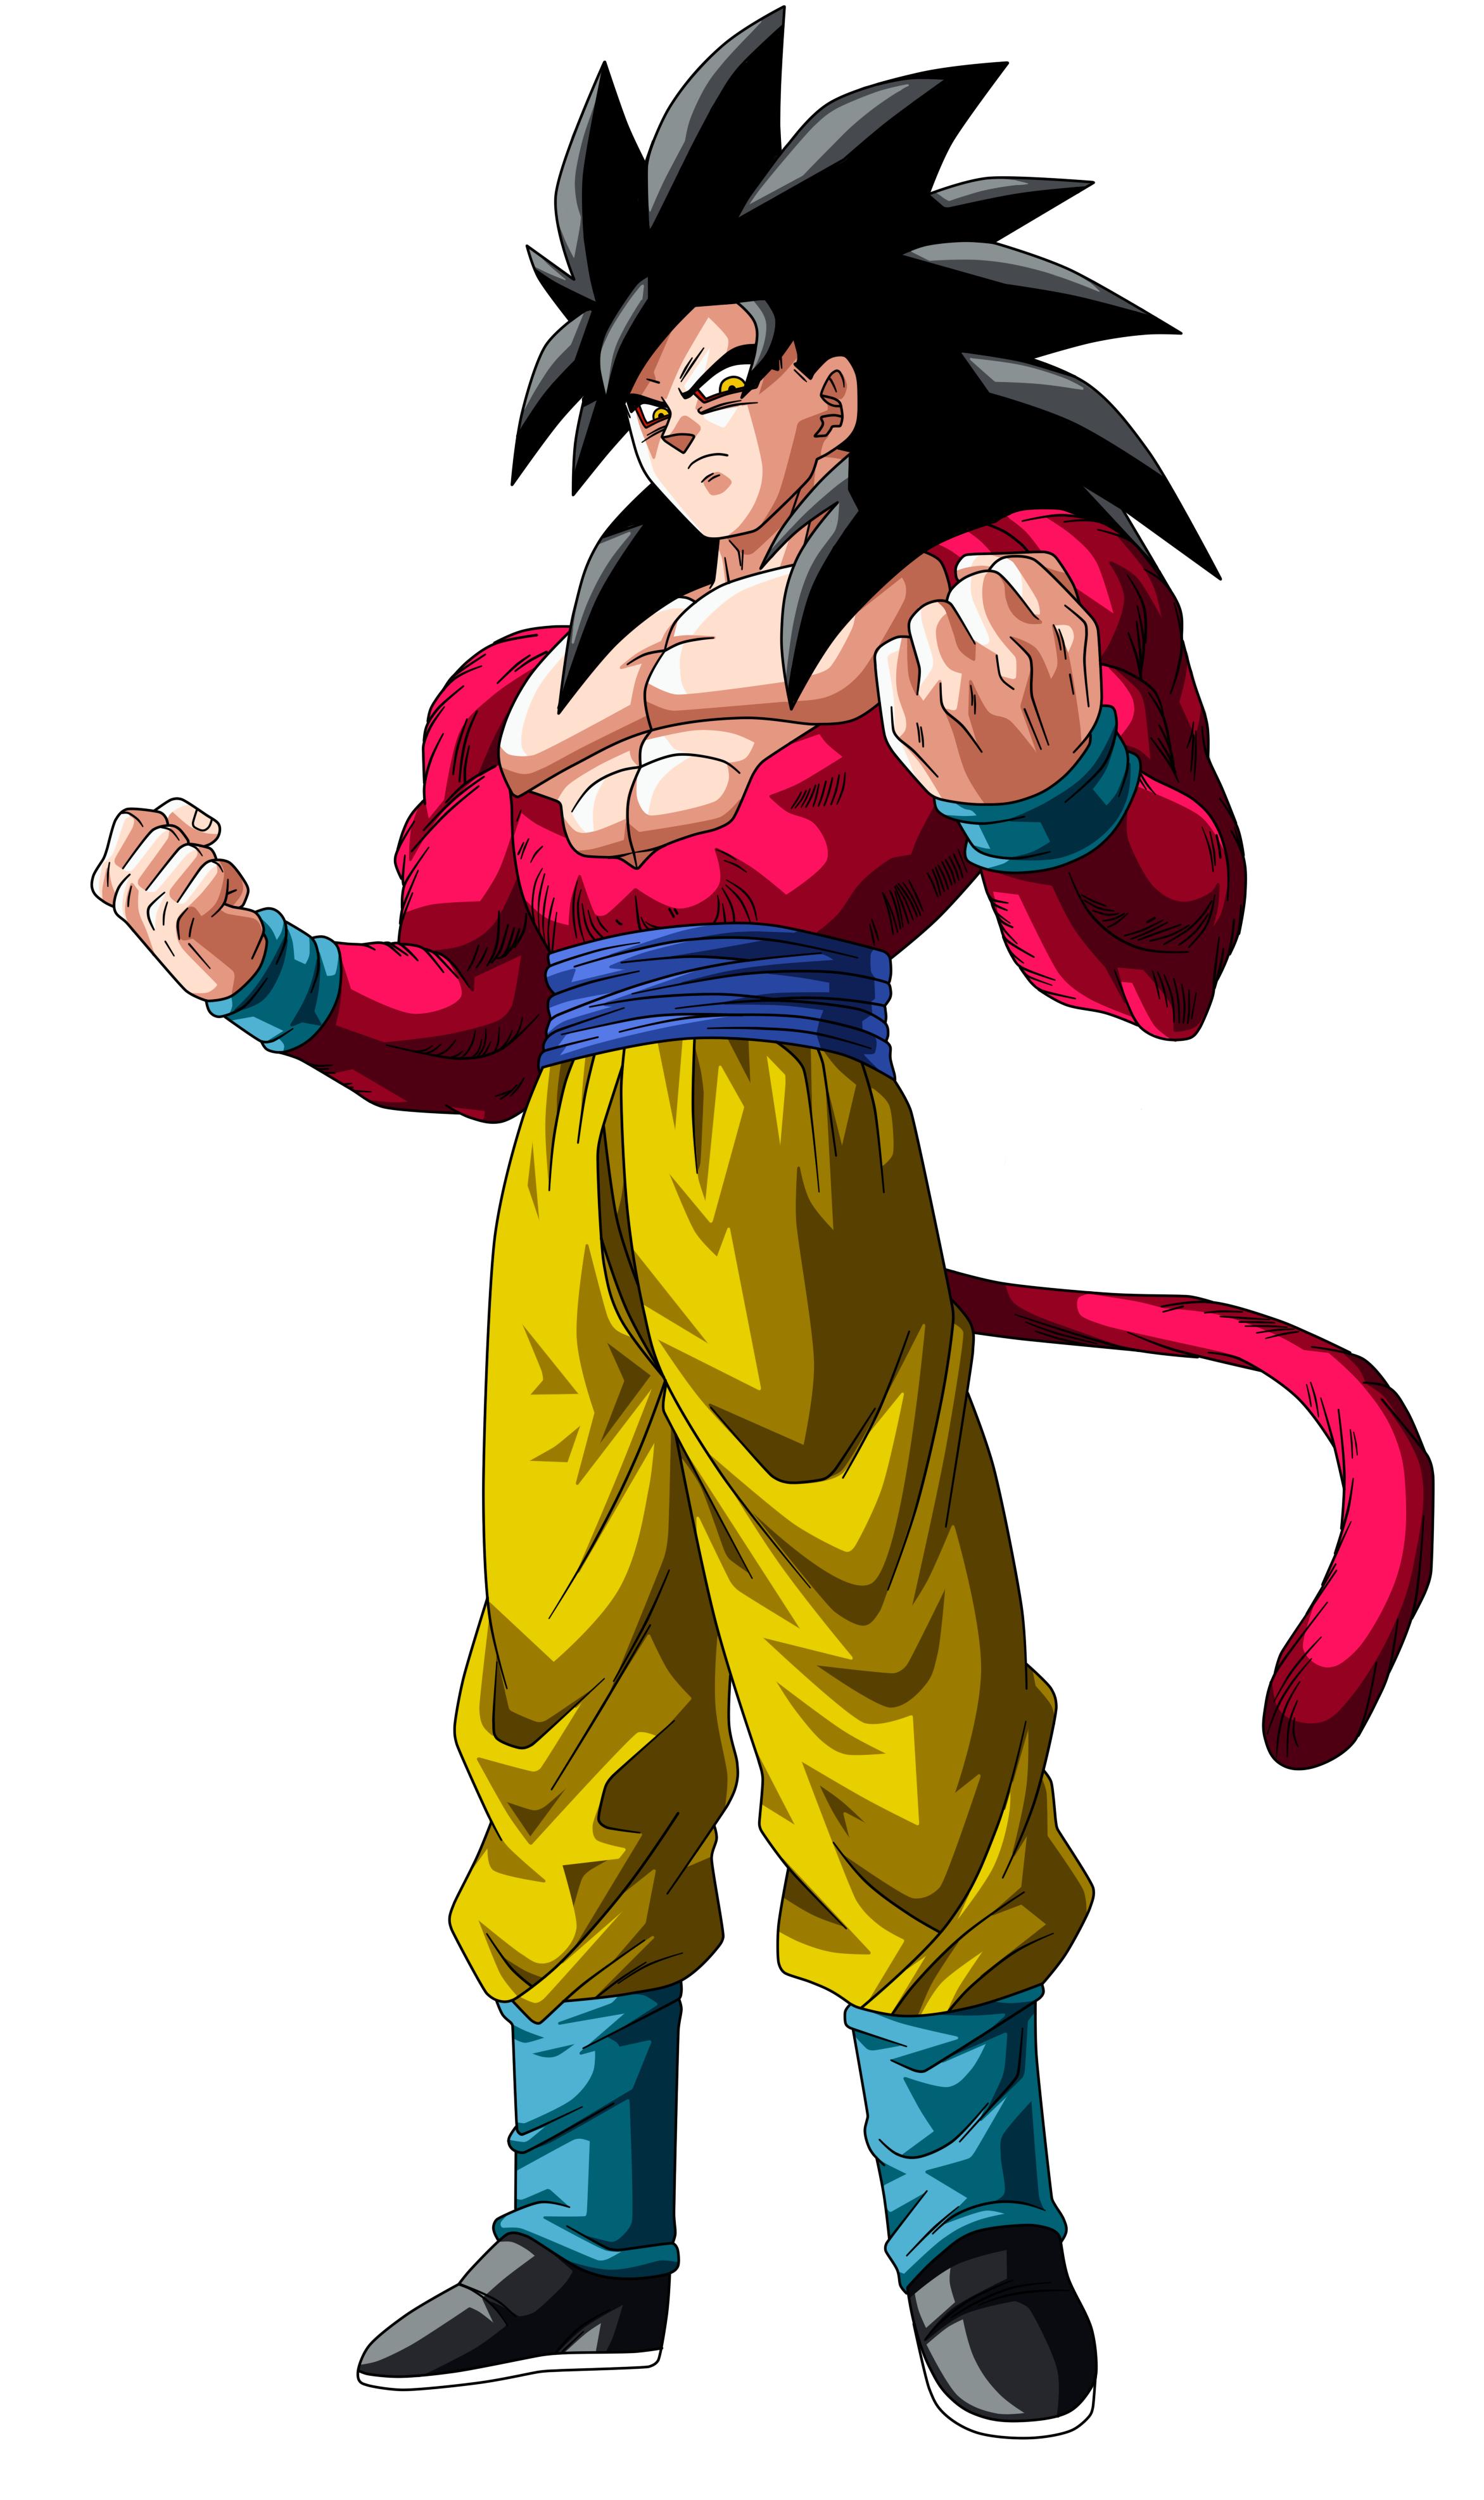 Goku super saiyan 4 - Super saiyan 6 goku pictures ...